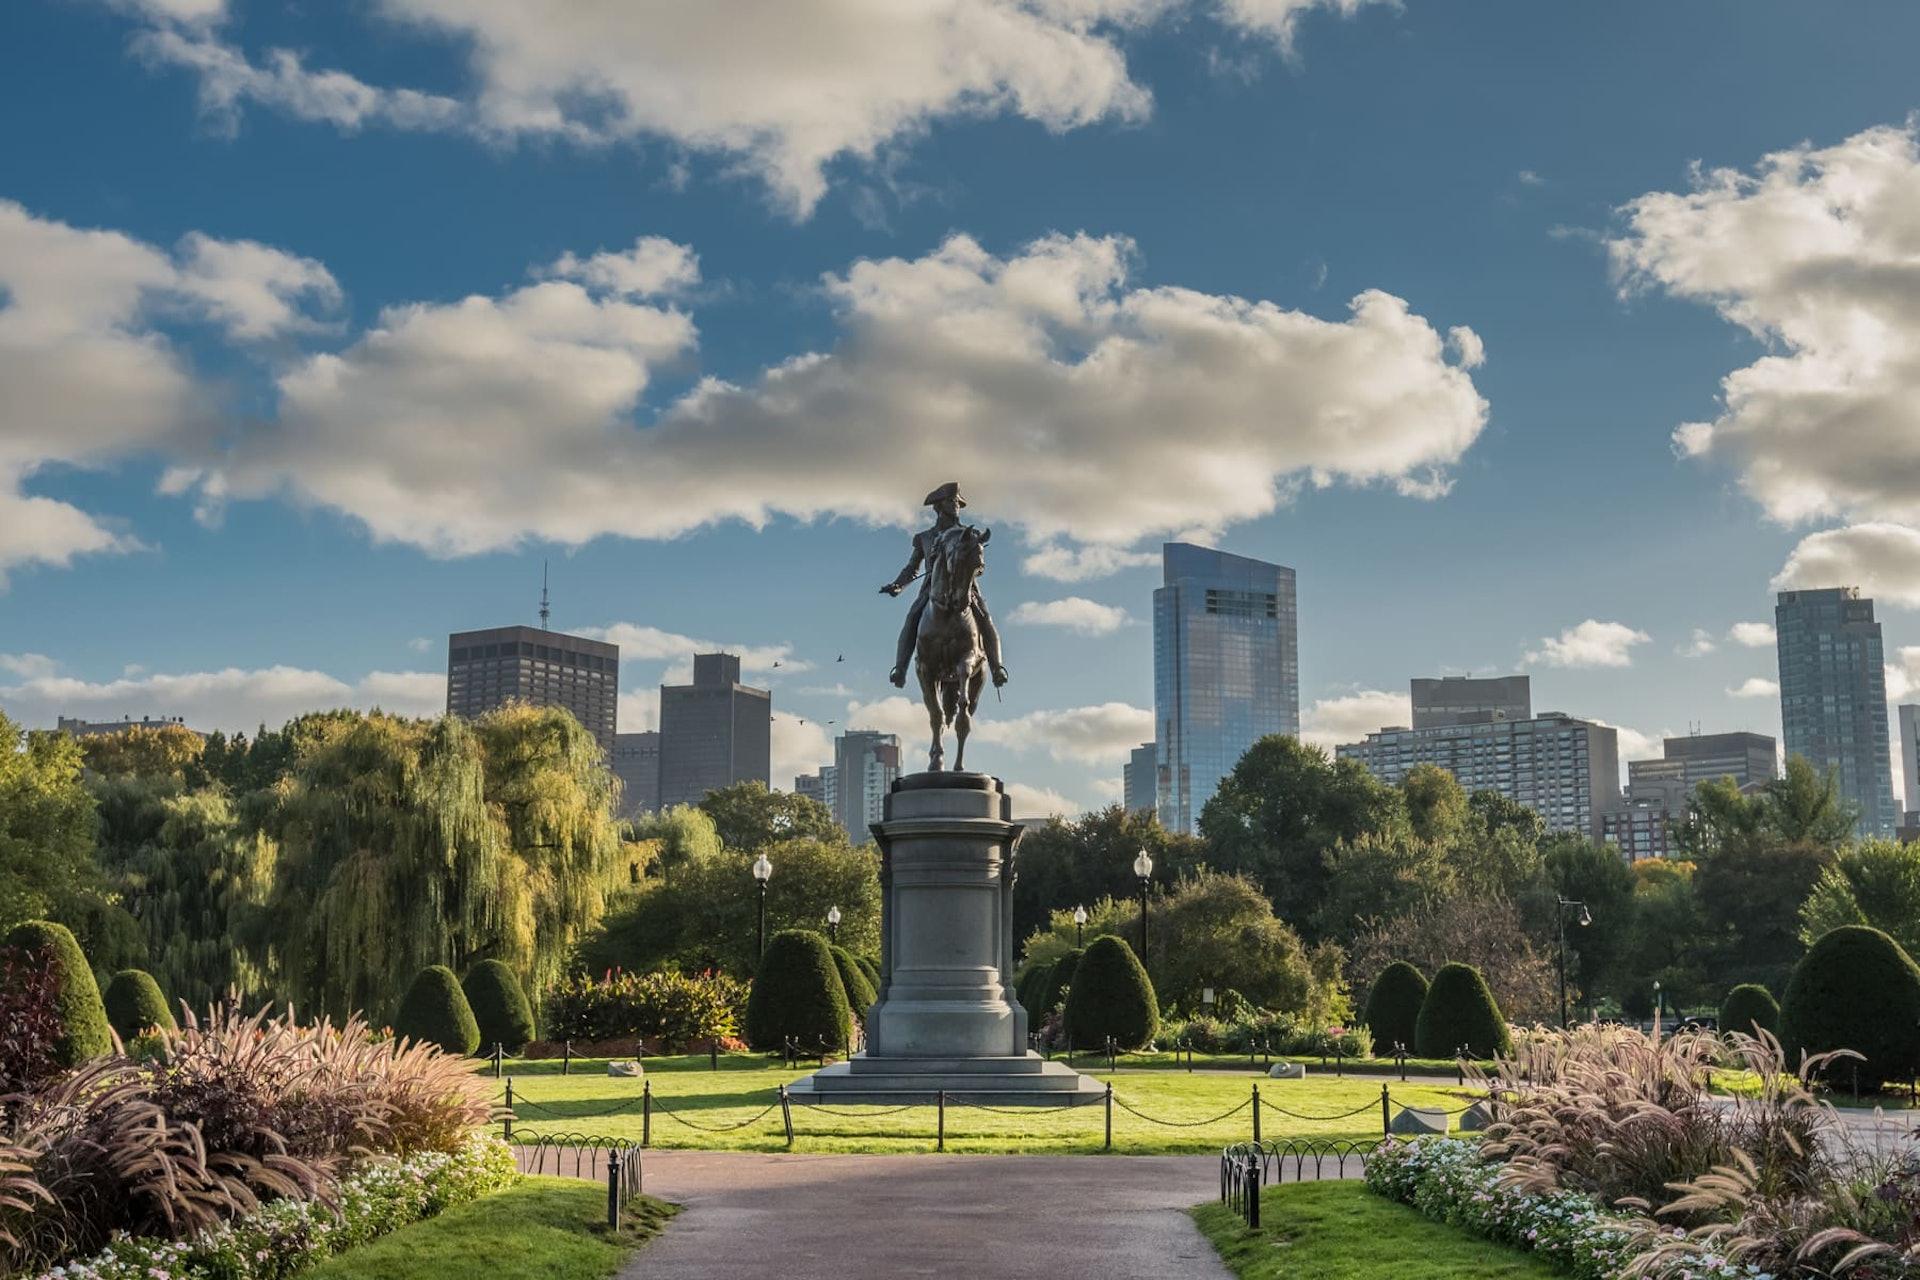 Monument in Boston Public Garden, a city park in Boston, Massachusetts